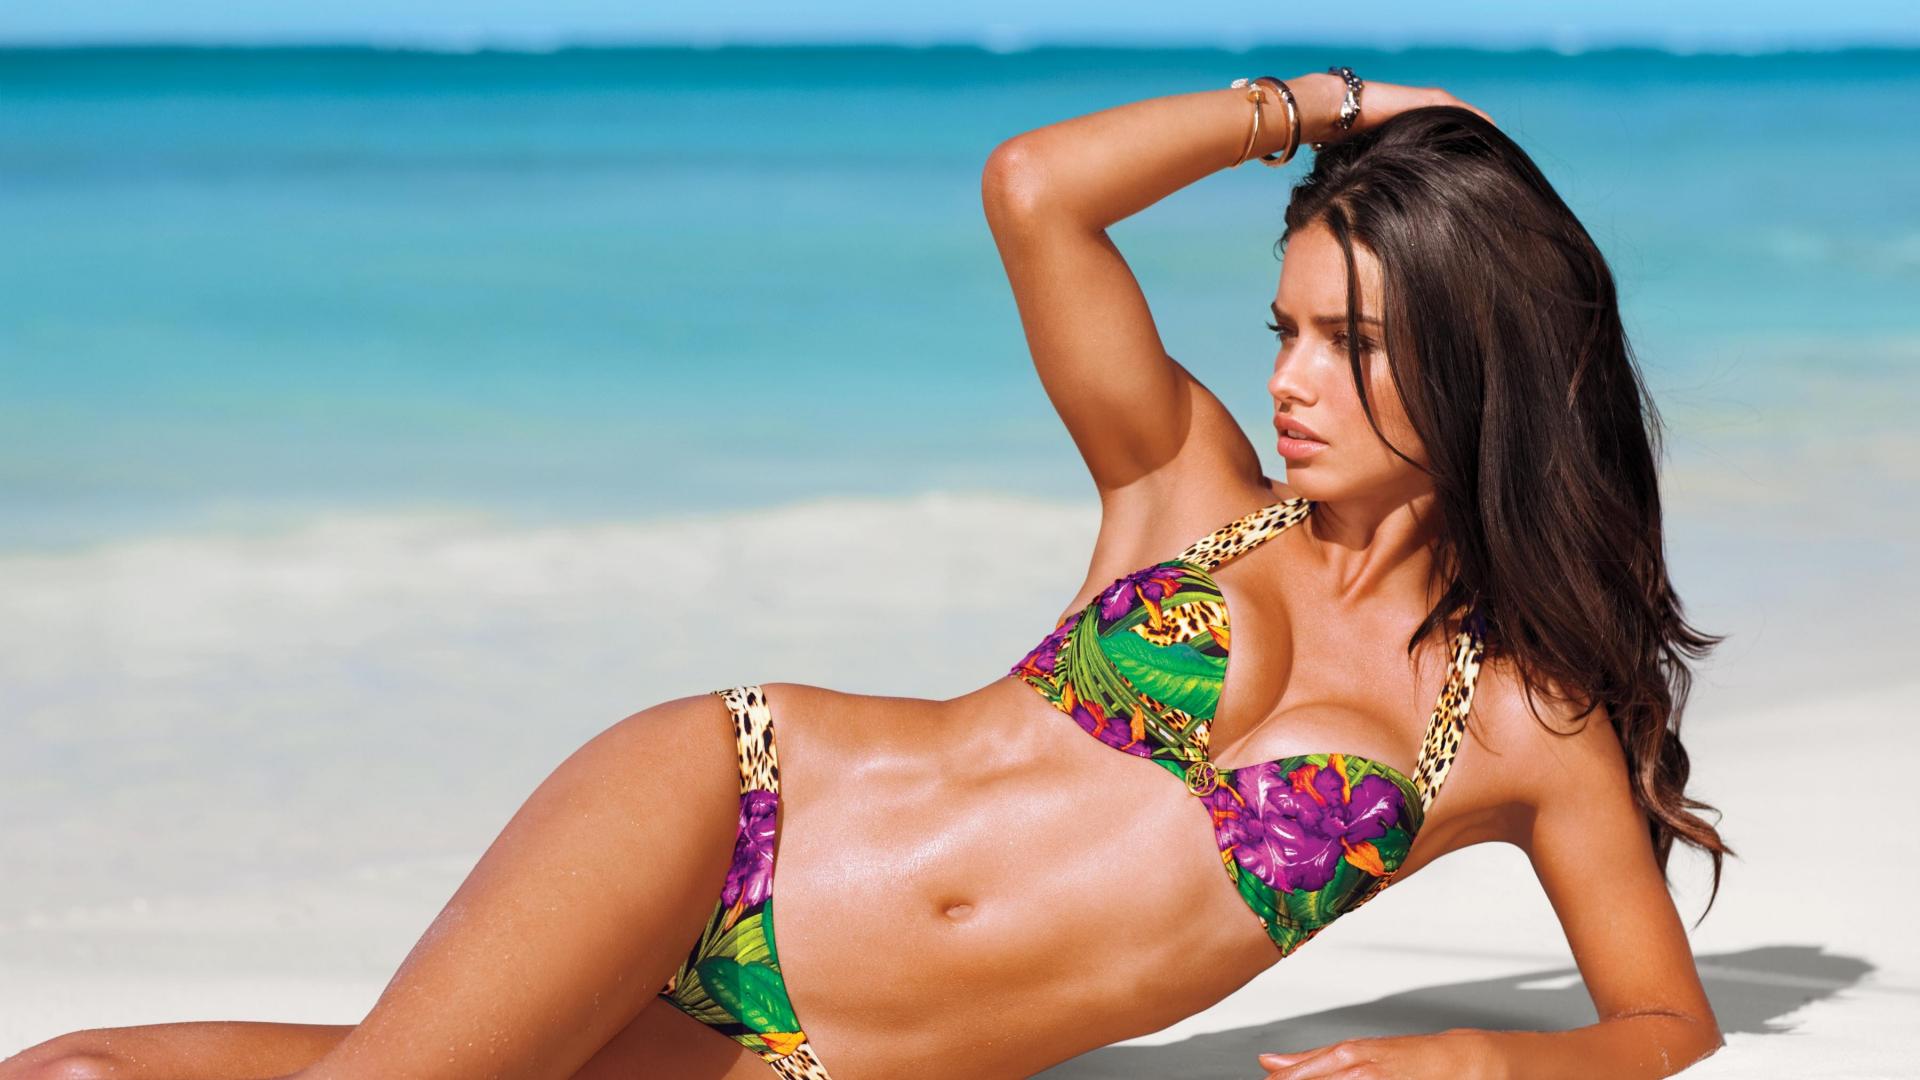 Hot bikini girls wallpaper, free starwars porn videos